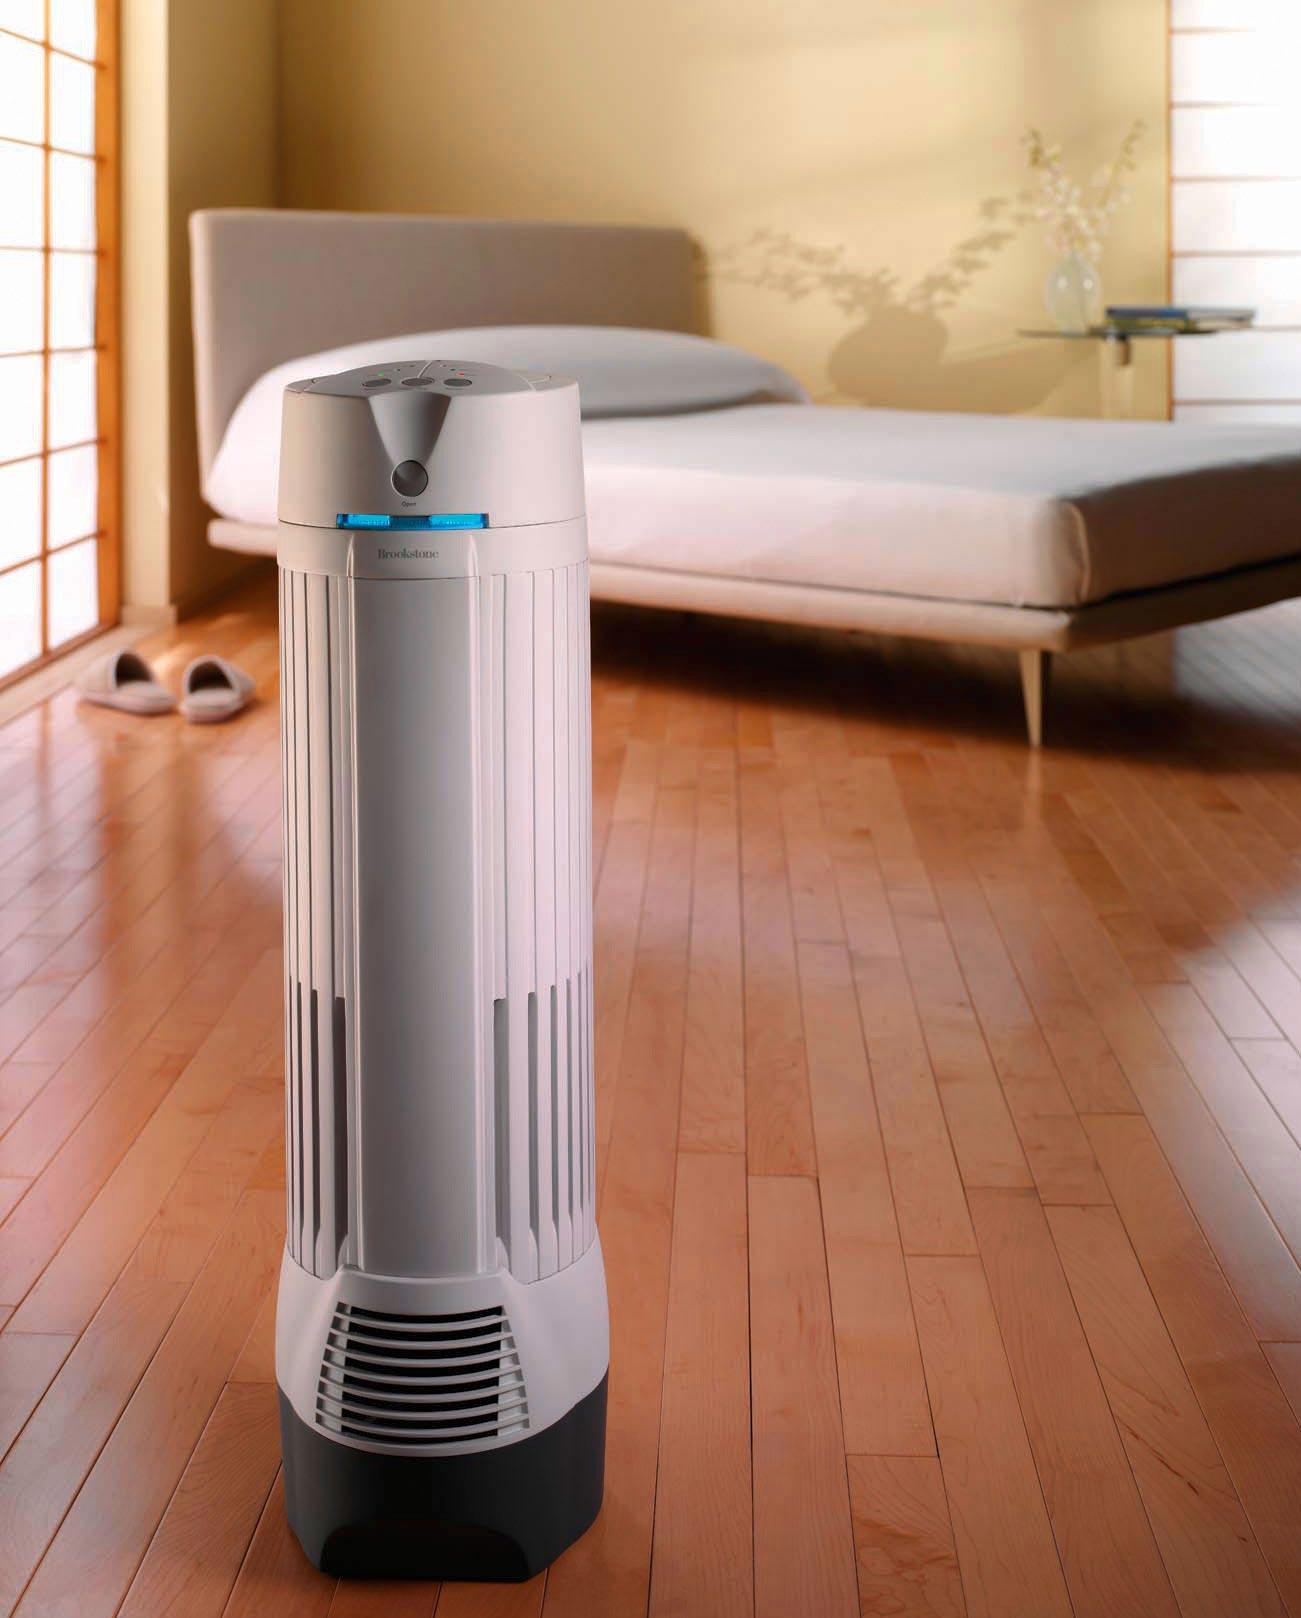 bedroom-w-brookstone-air-purifier.jpg